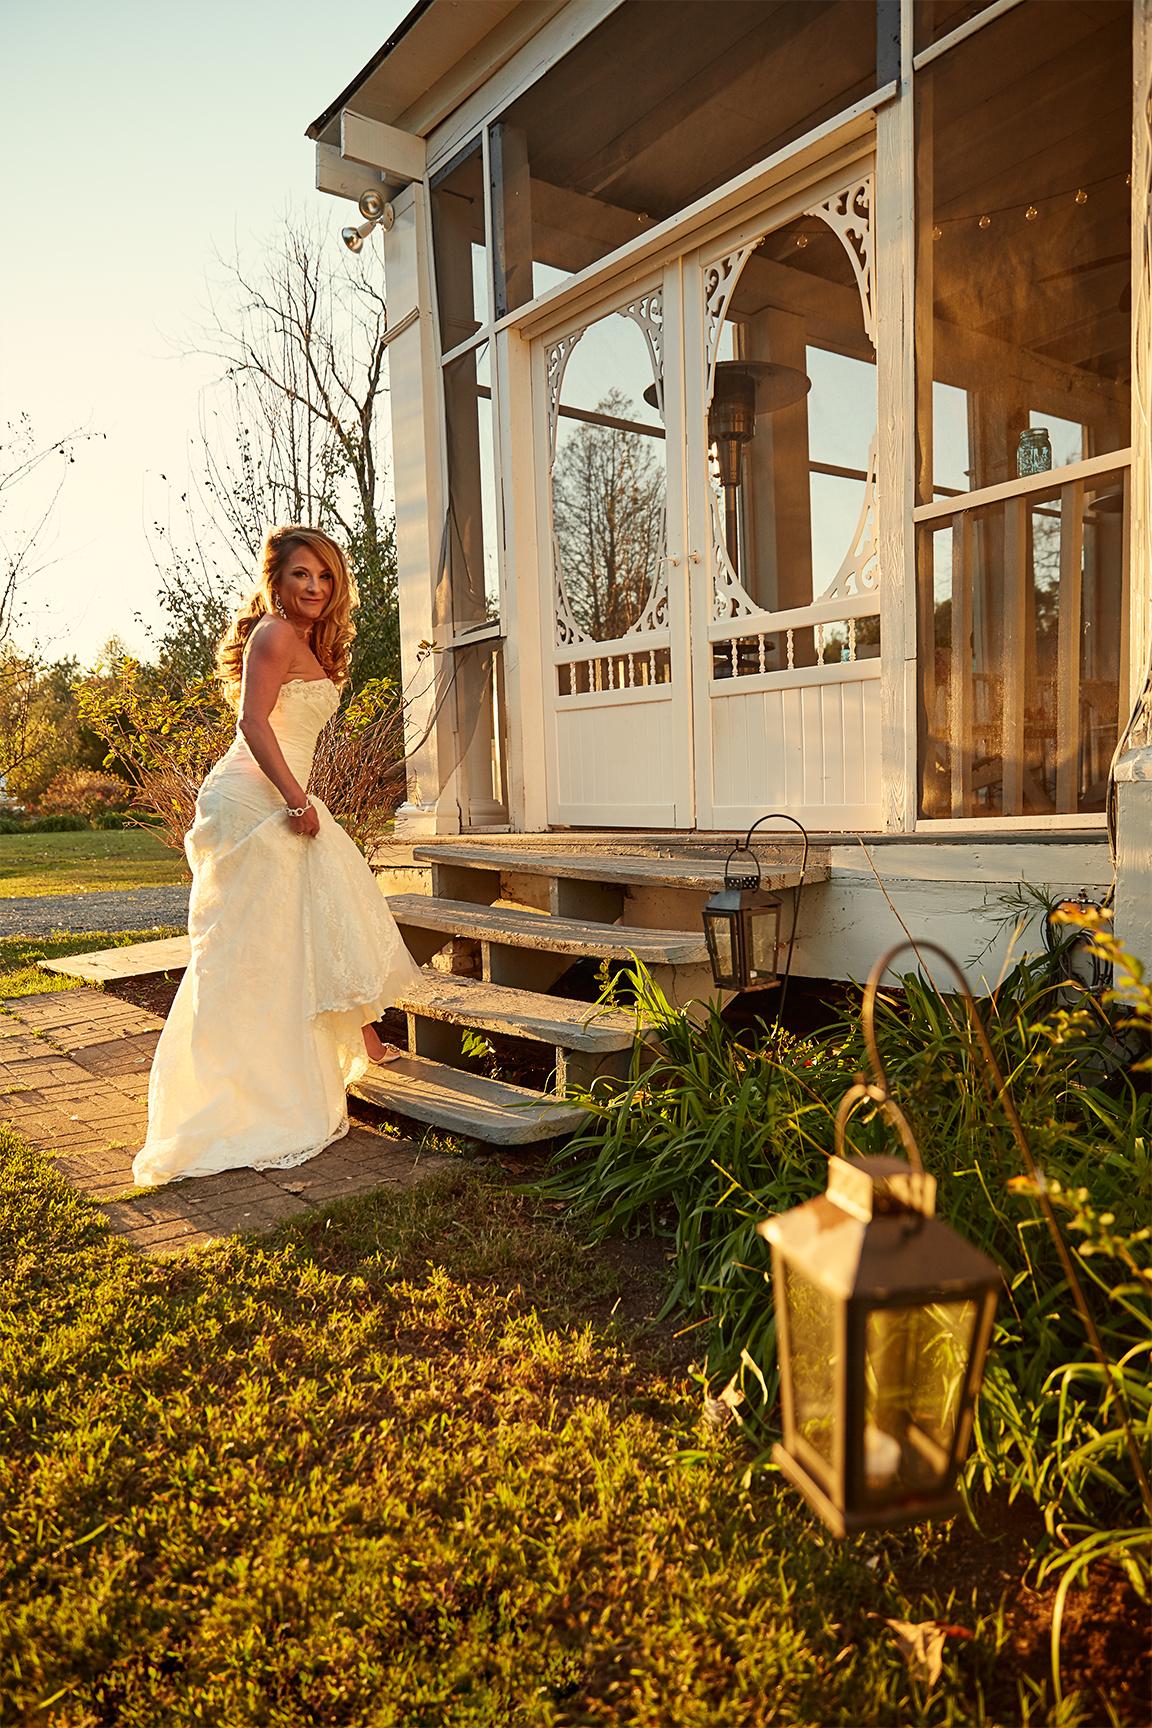 _P_00116Tina-And-Miles-Wedding_N,2015_Raleigh_NC_ErnestoSue407.jpeg